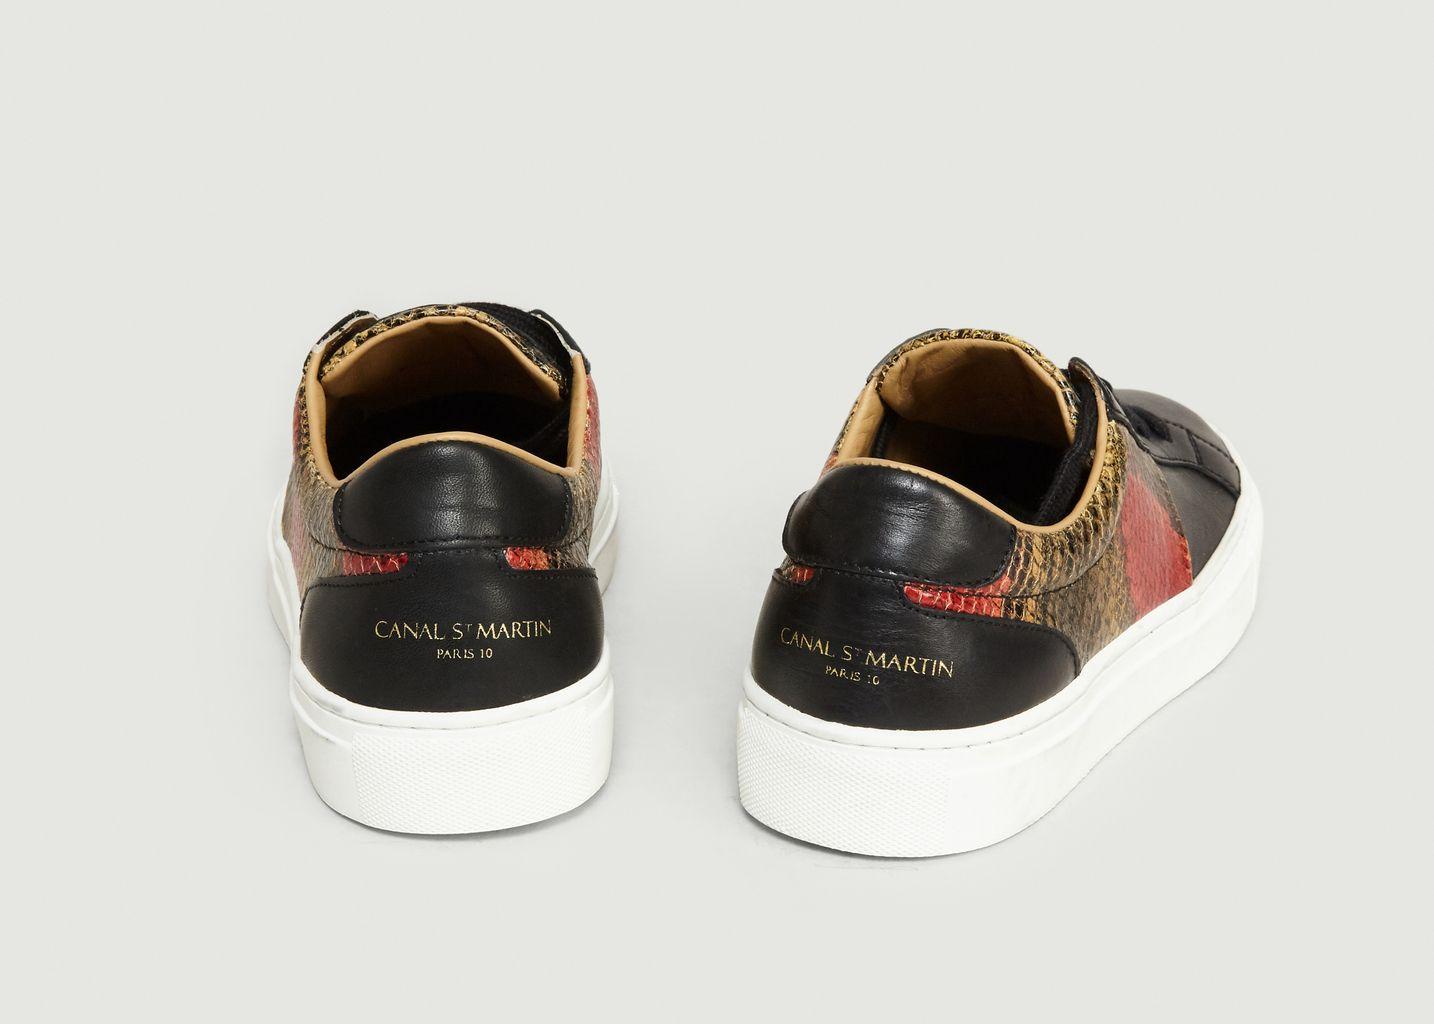 Sneakers Empiècement Effet Python Louis - Canal Saint Martin